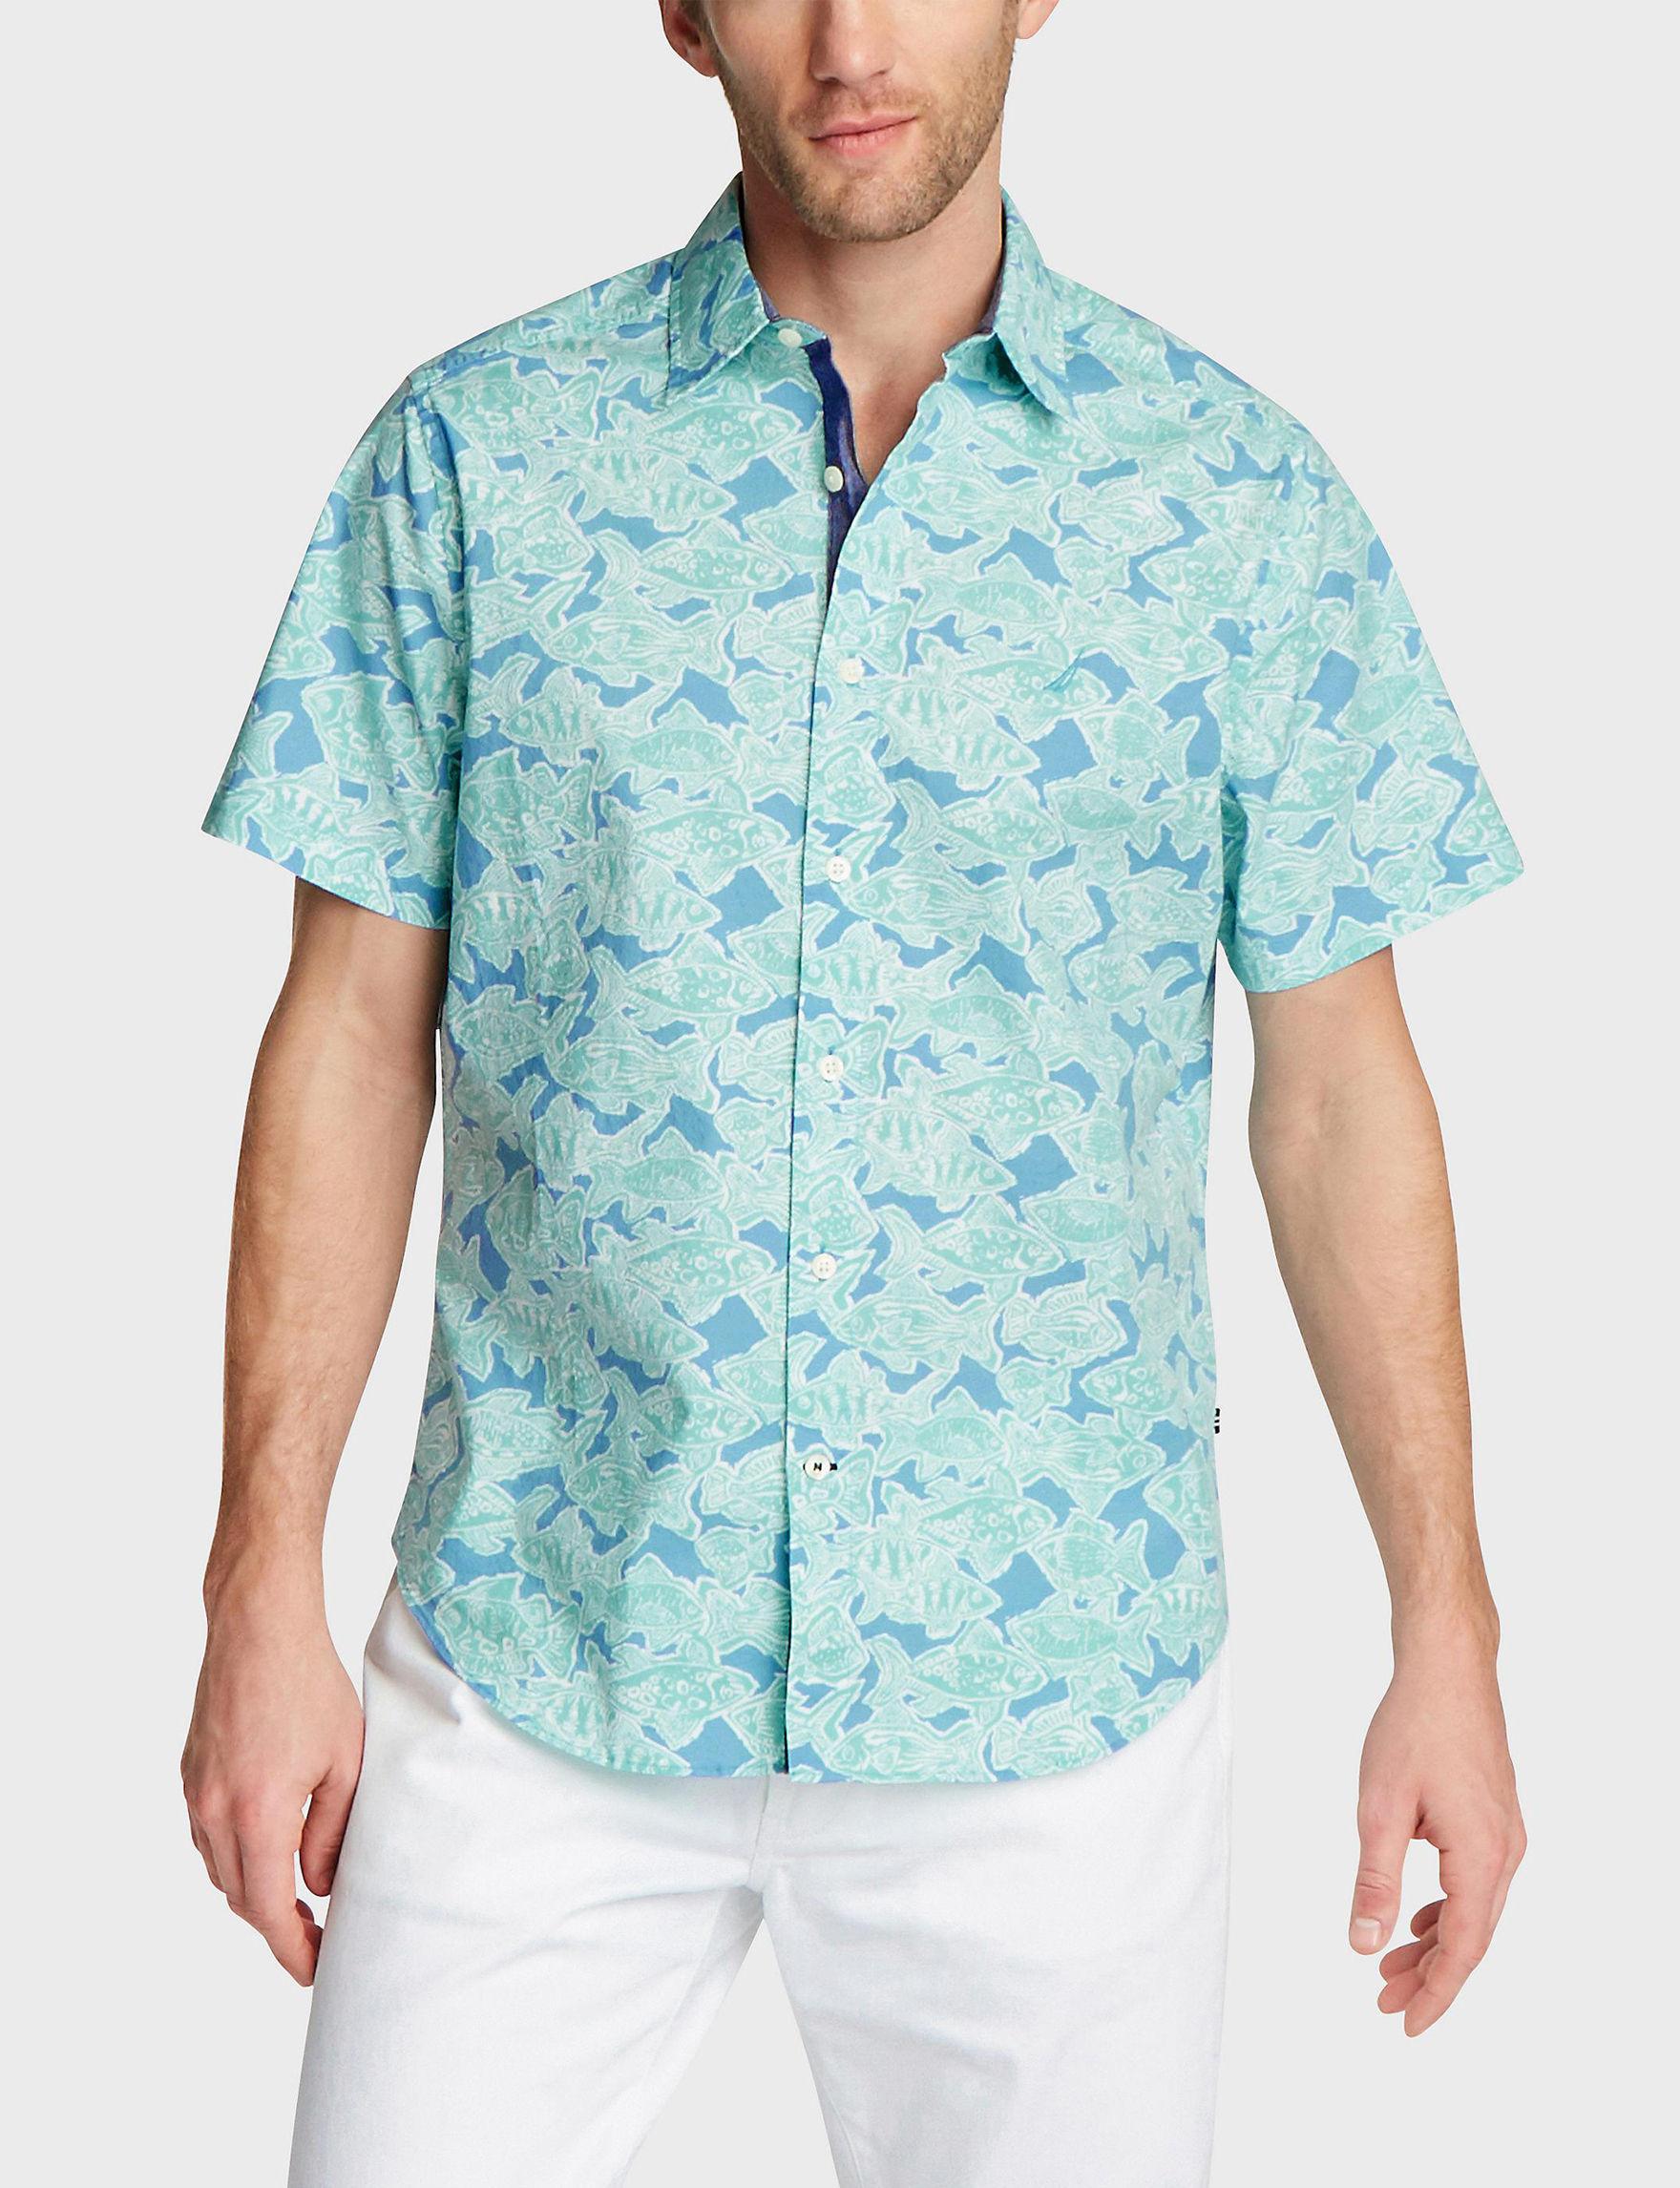 Nautica Alaskan Blue Casual Button Down Shirts